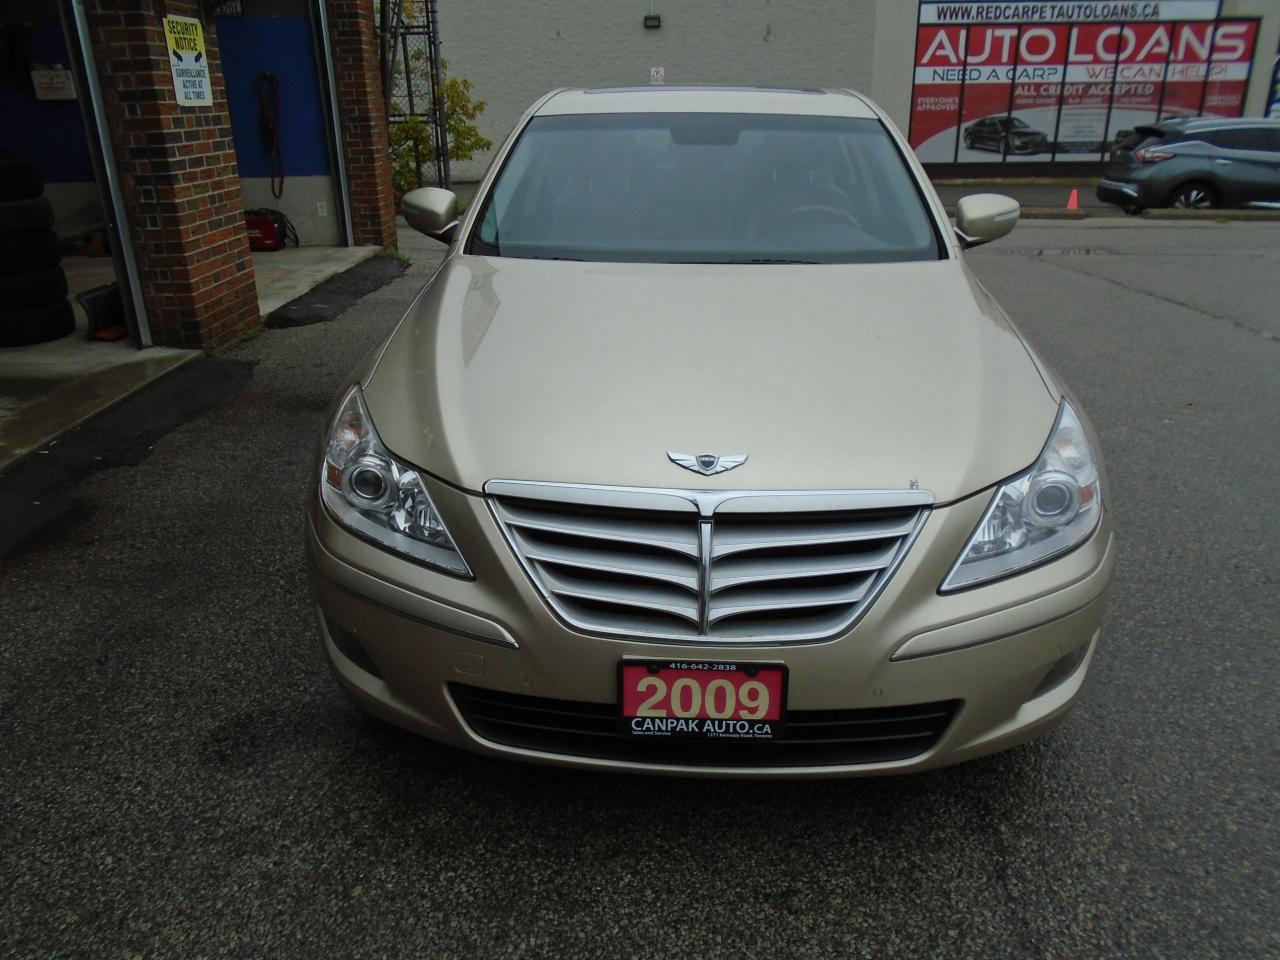 2009 Hyundai Genesis. 4.6L